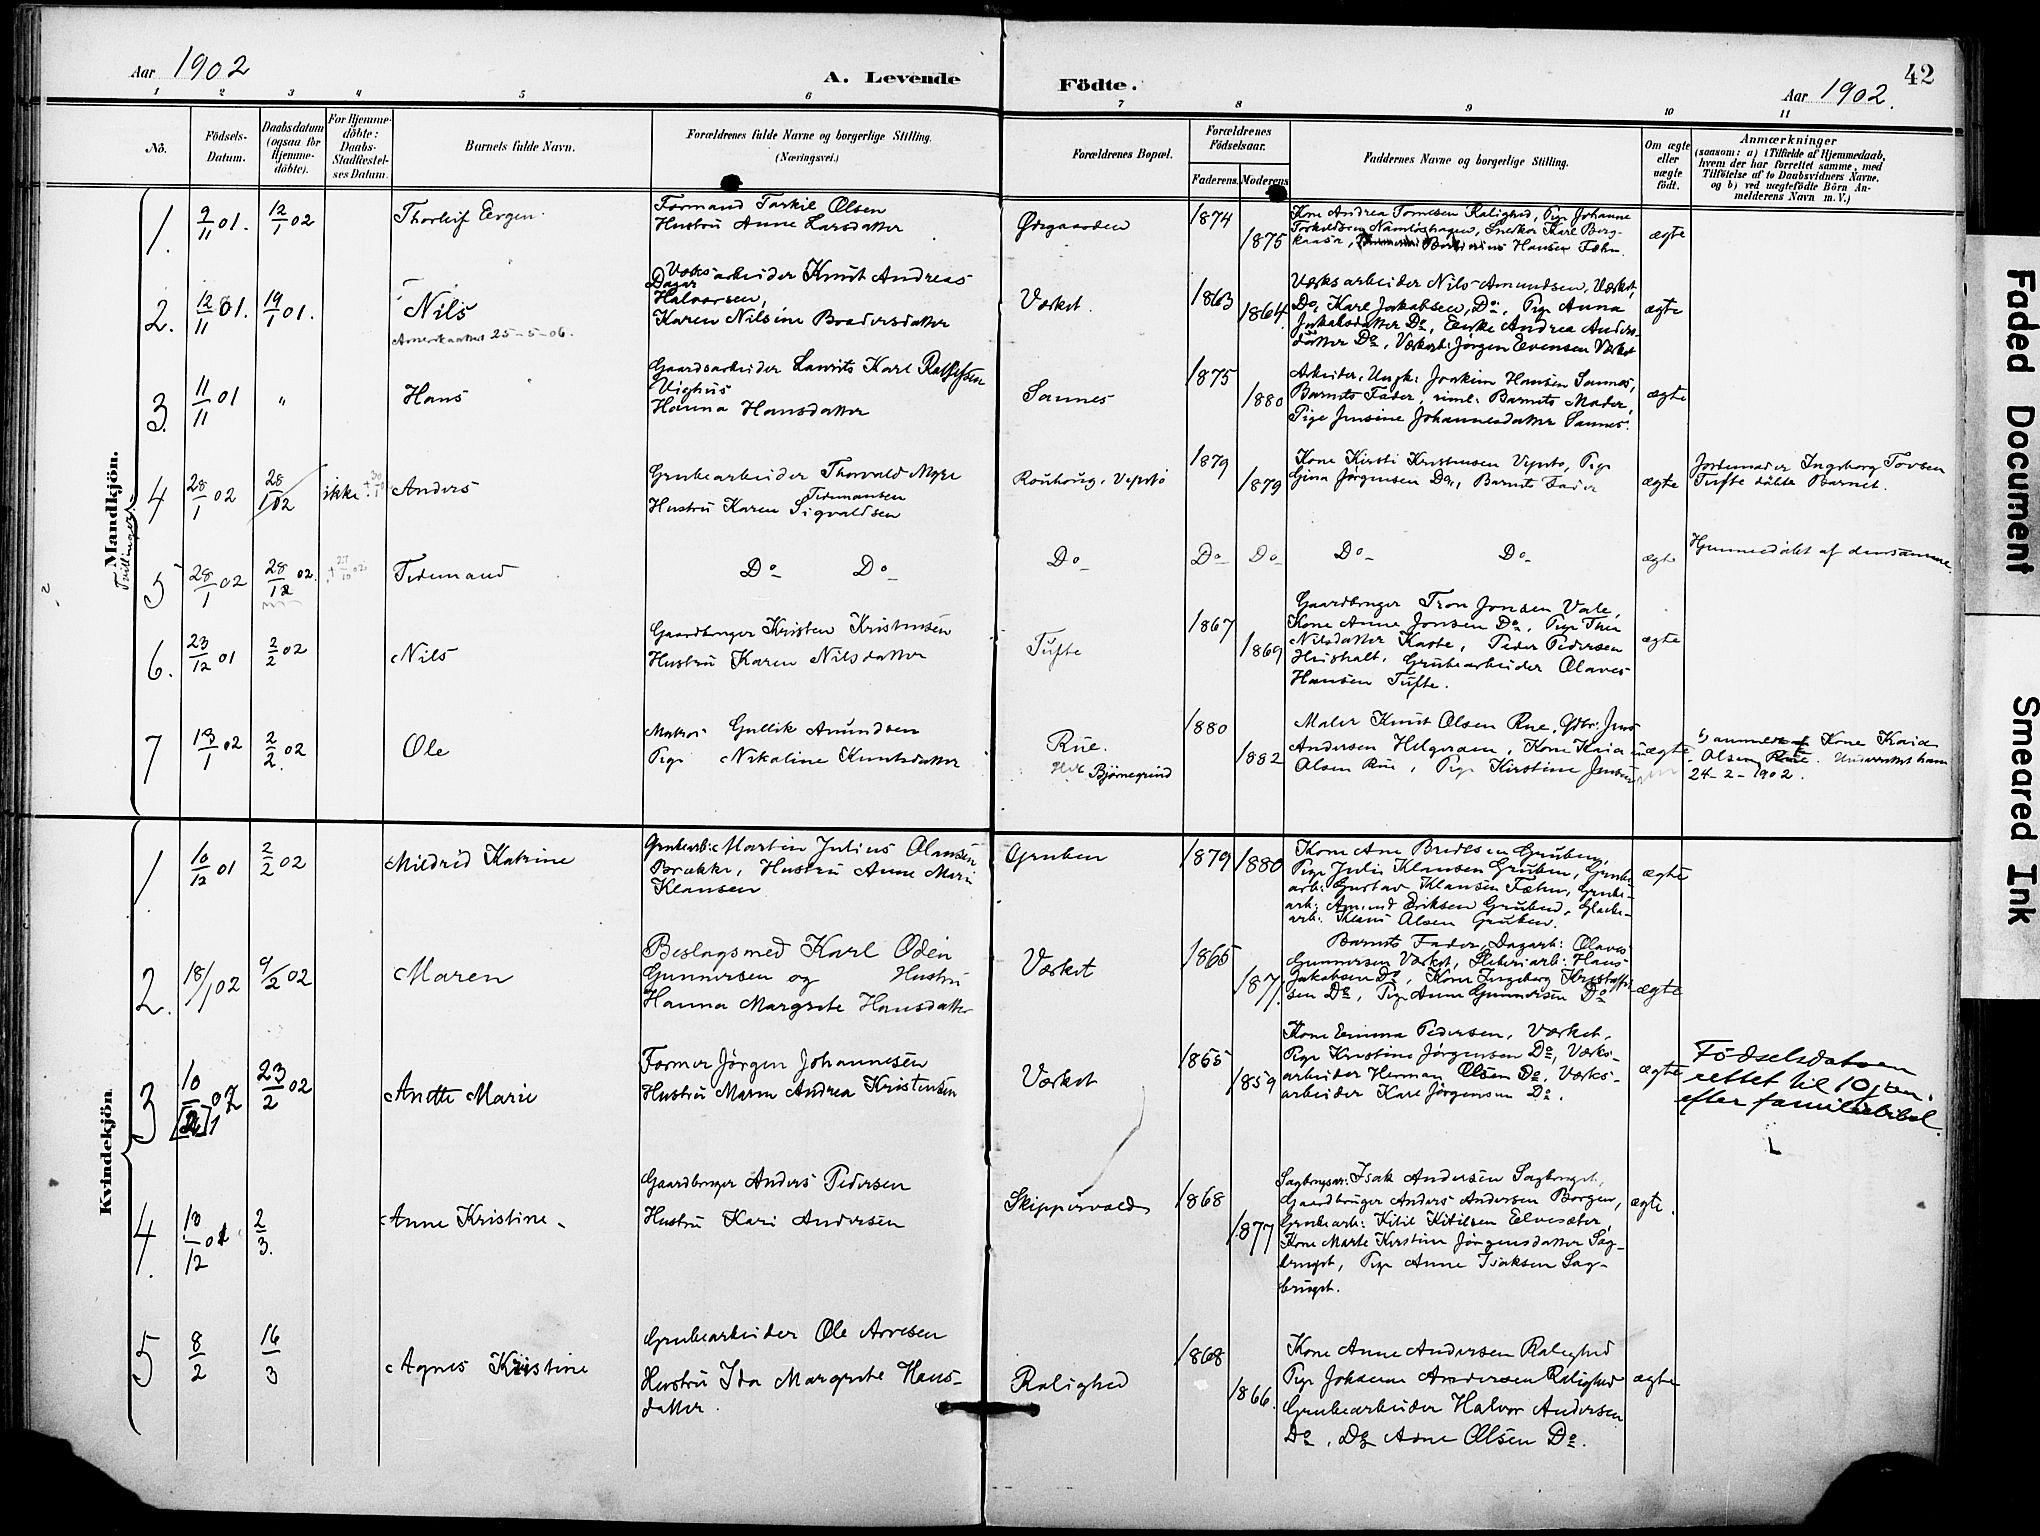 SAKO, Holla kirkebøker, F/Fa/L0010: Ministerialbok nr. 10, 1897-1907, s. 42